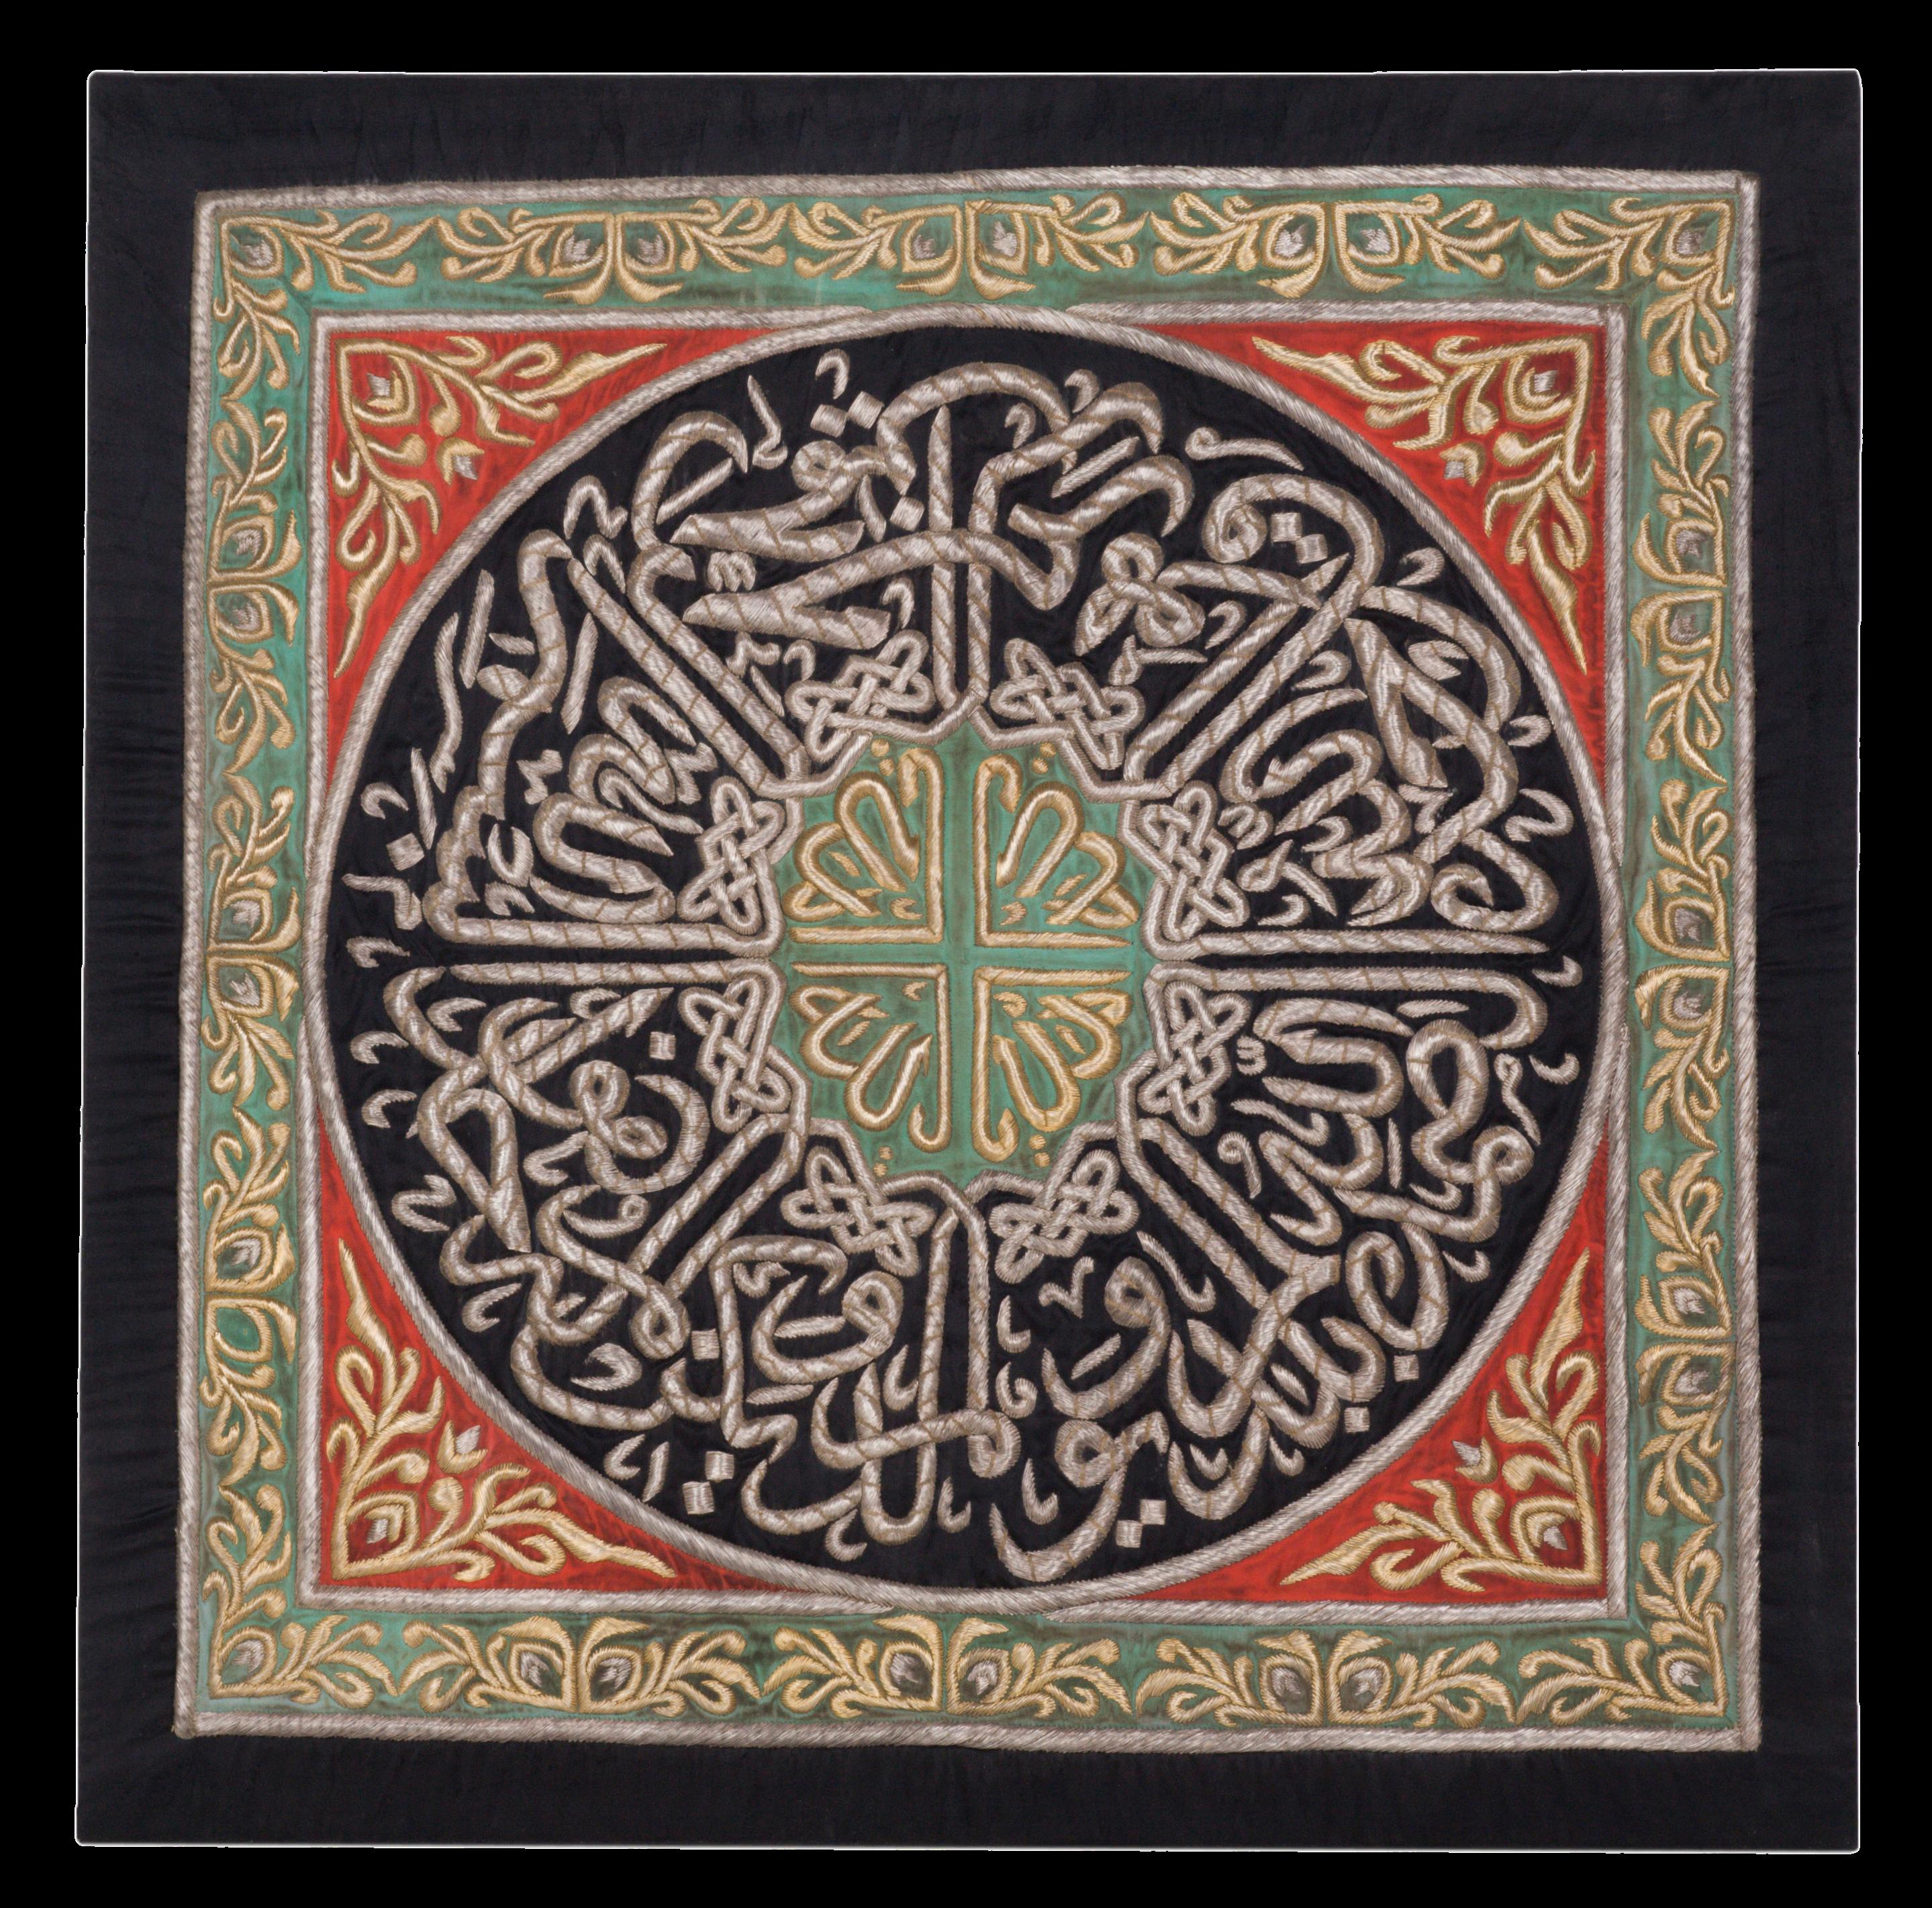 Square panel (kardashiyyah) from the kiswah of the Ka'bah